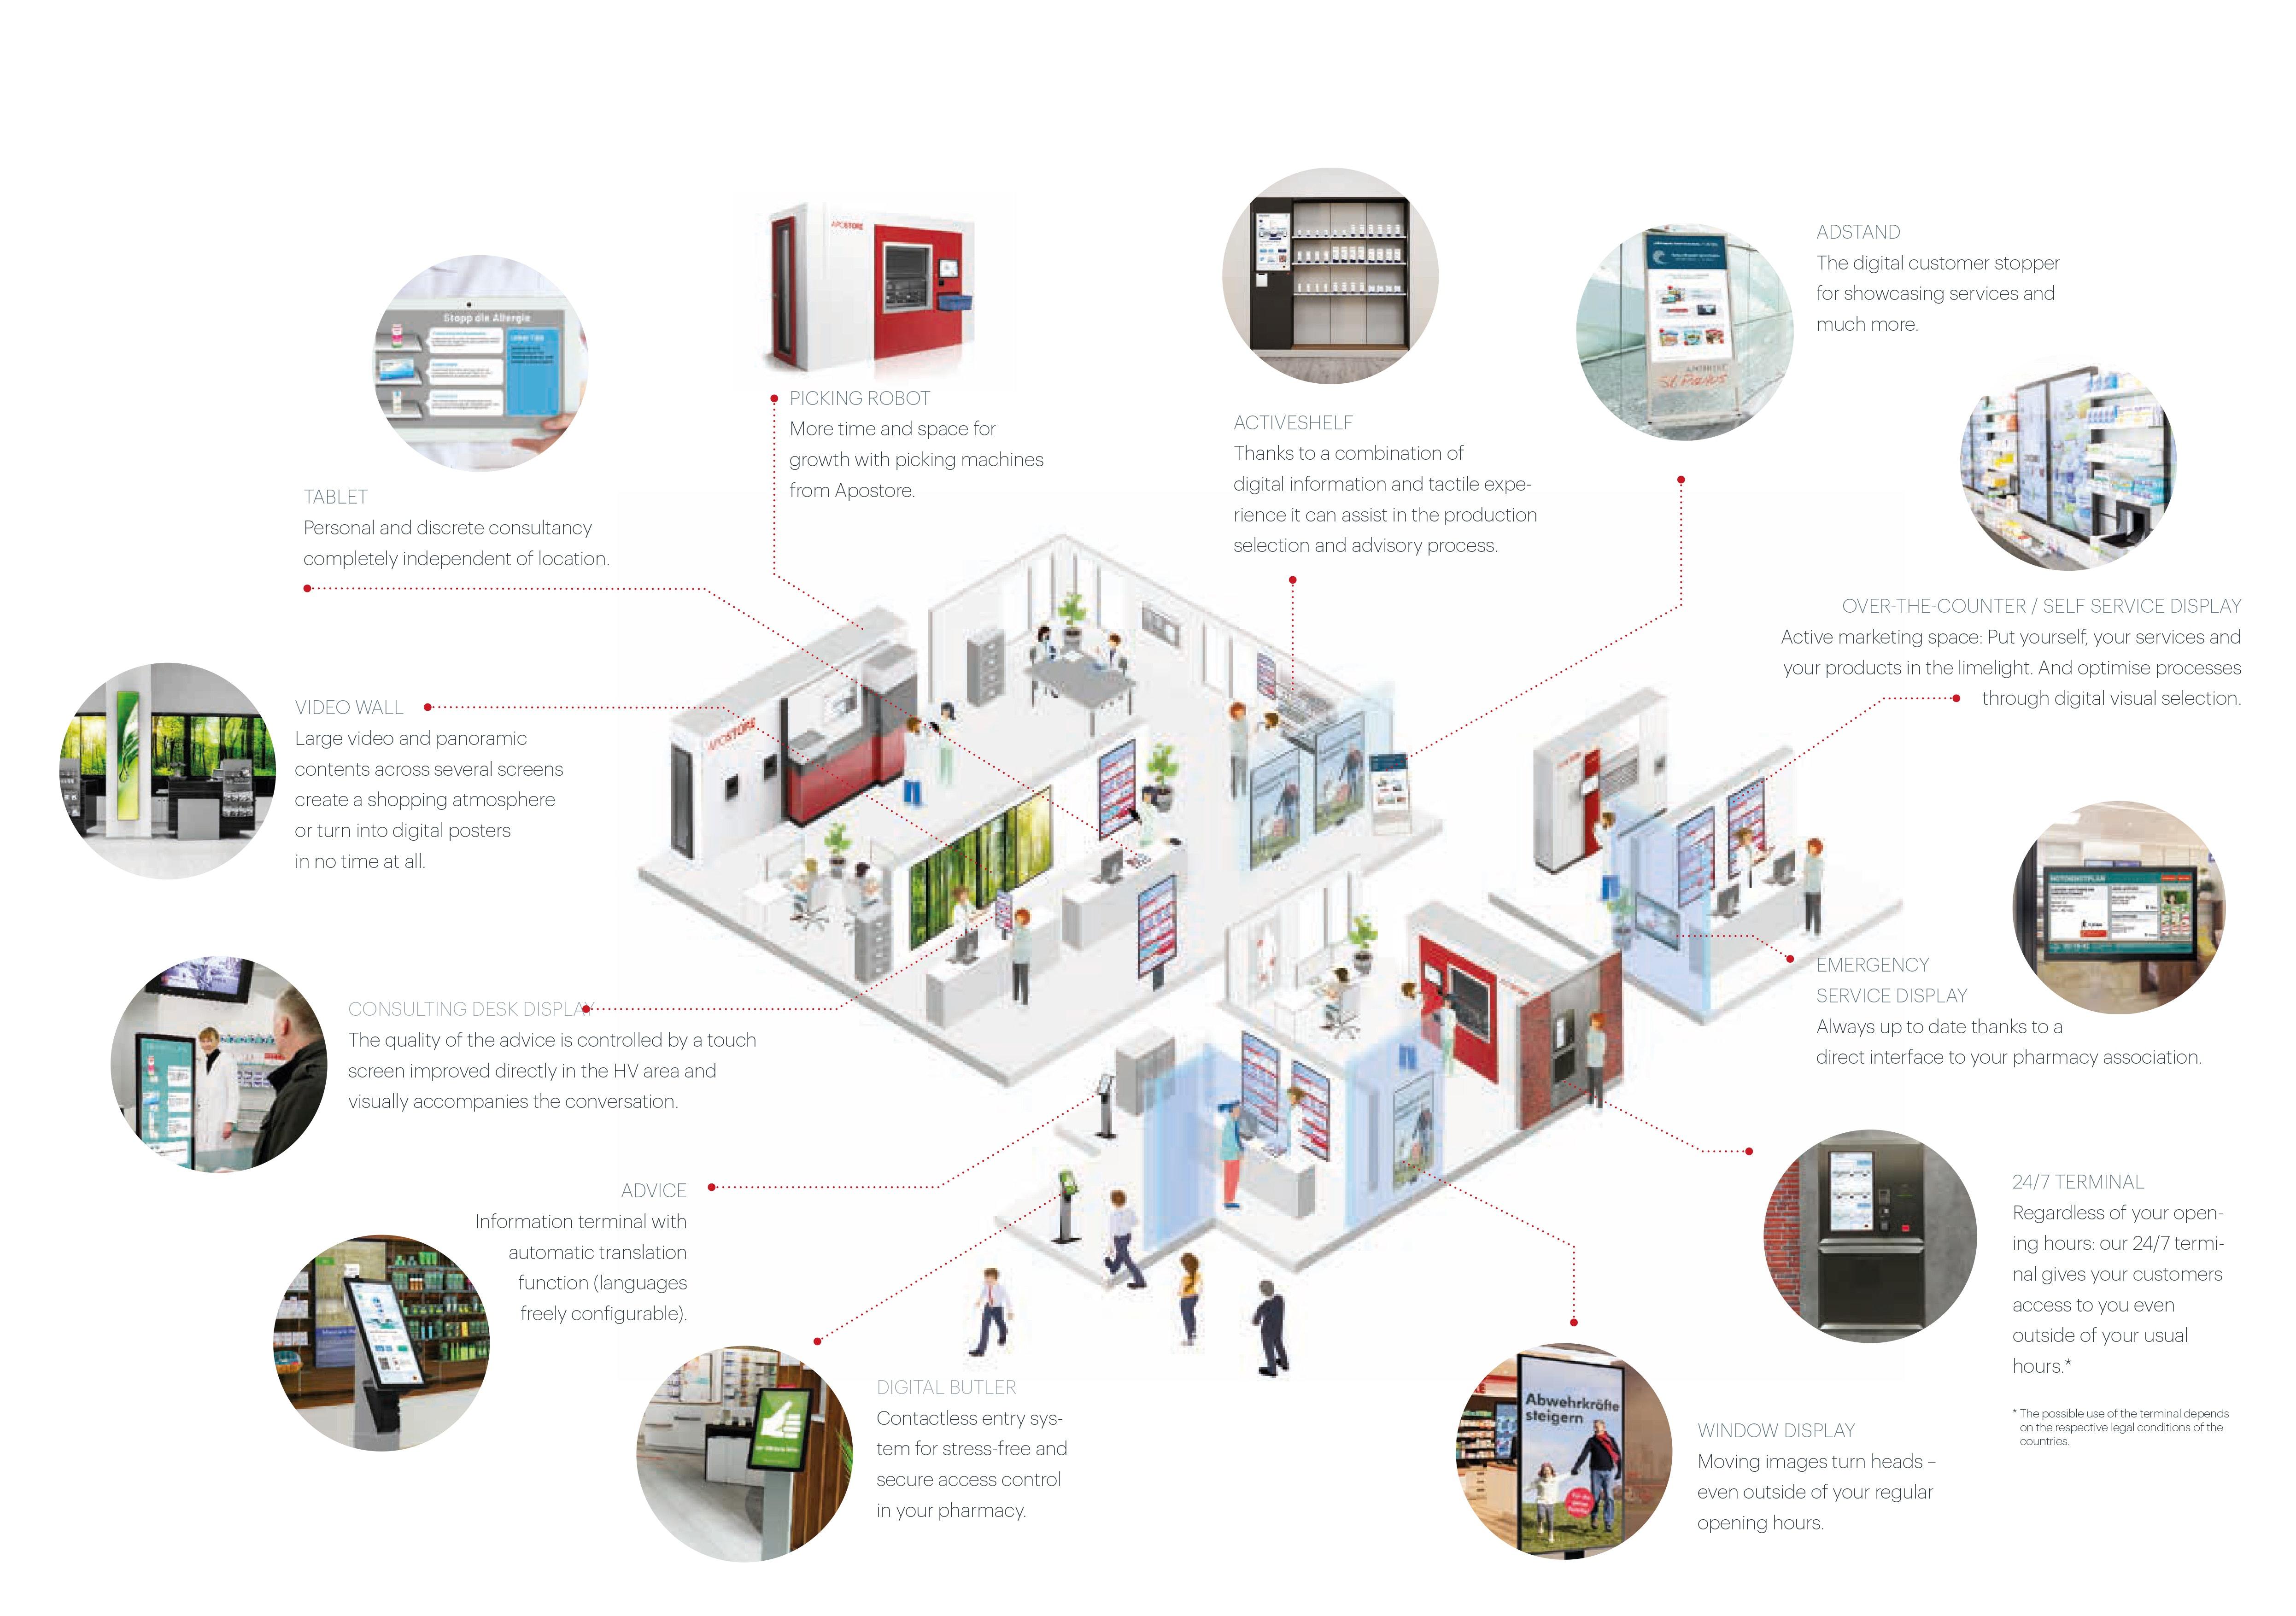 Apostore Pharmacy Screens Digital Solutions Overview EN